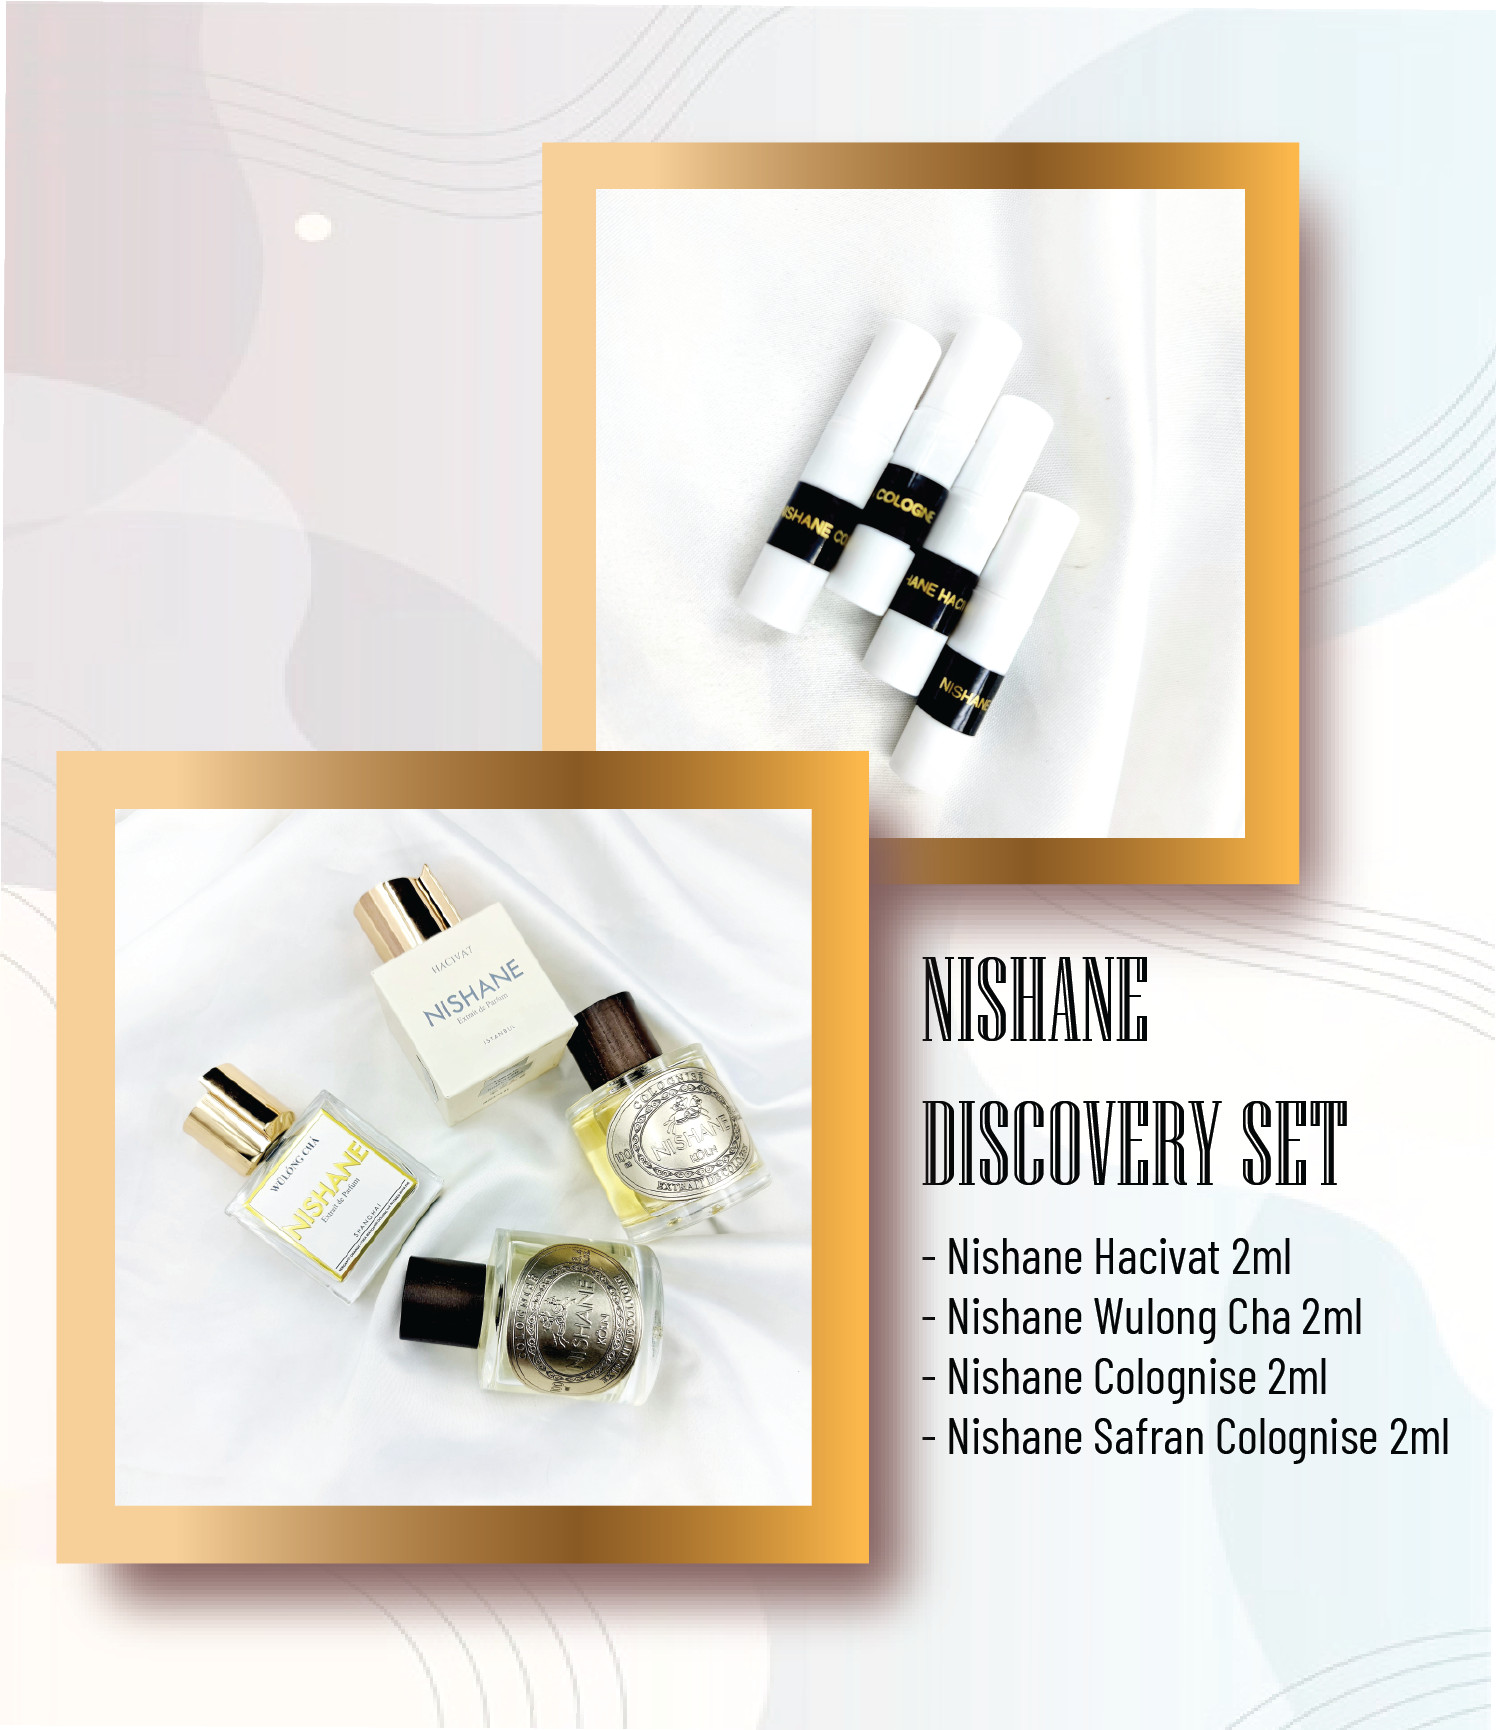 Discovery SET Nishane (Hacivat 2ml + Wulong Cha 2ml + Colognise 2ml + Safran Colognise 2ml)